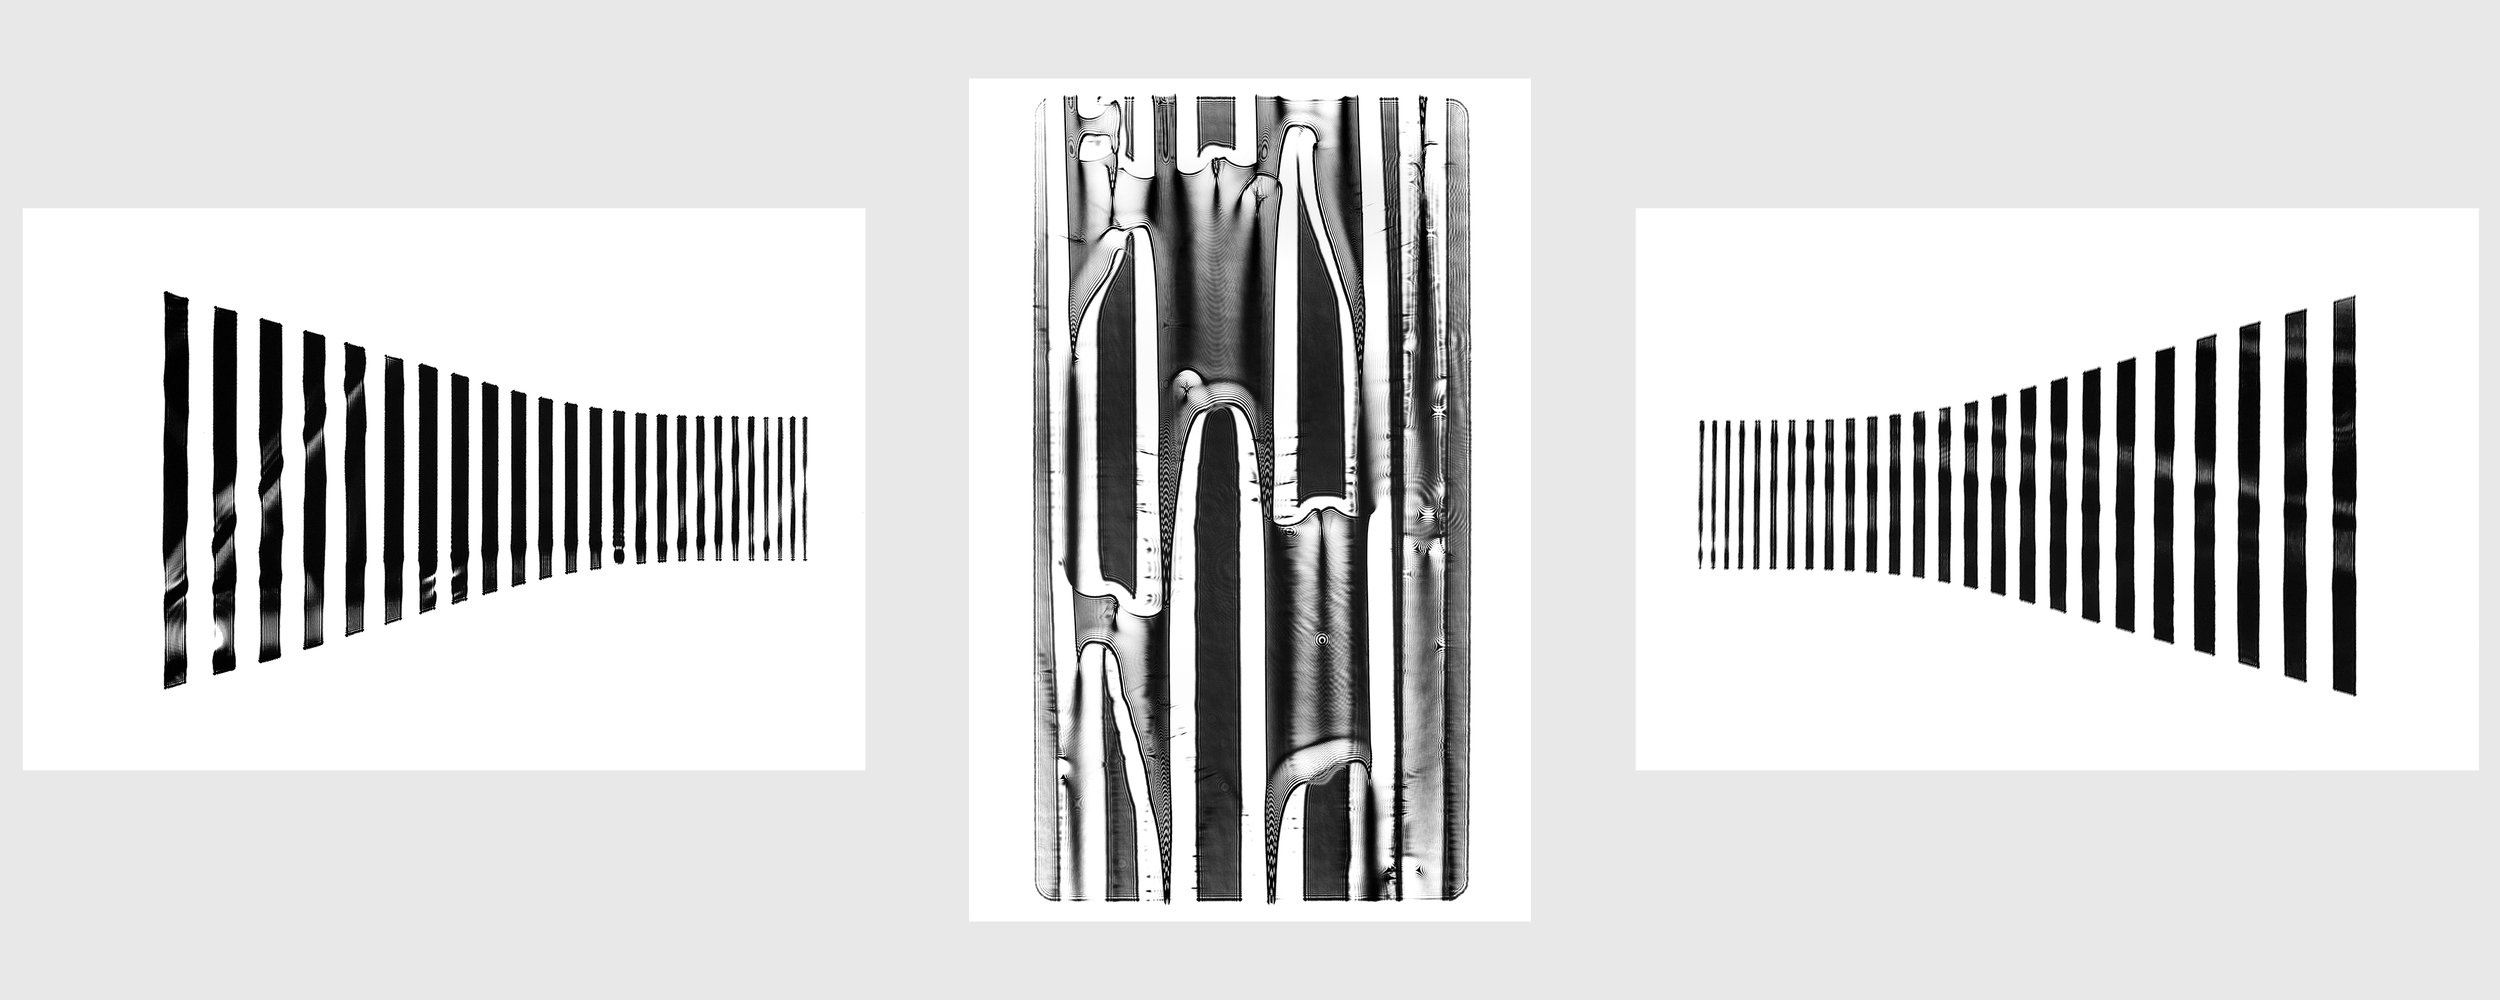 No Light 2019 at Camera (Centrul de Interes) Cluj-Napoca, Romania. Triptych #1 - 120x80 / 80x120 / 120x80. Title: CAPTURE THE UNCONTROLLABLE